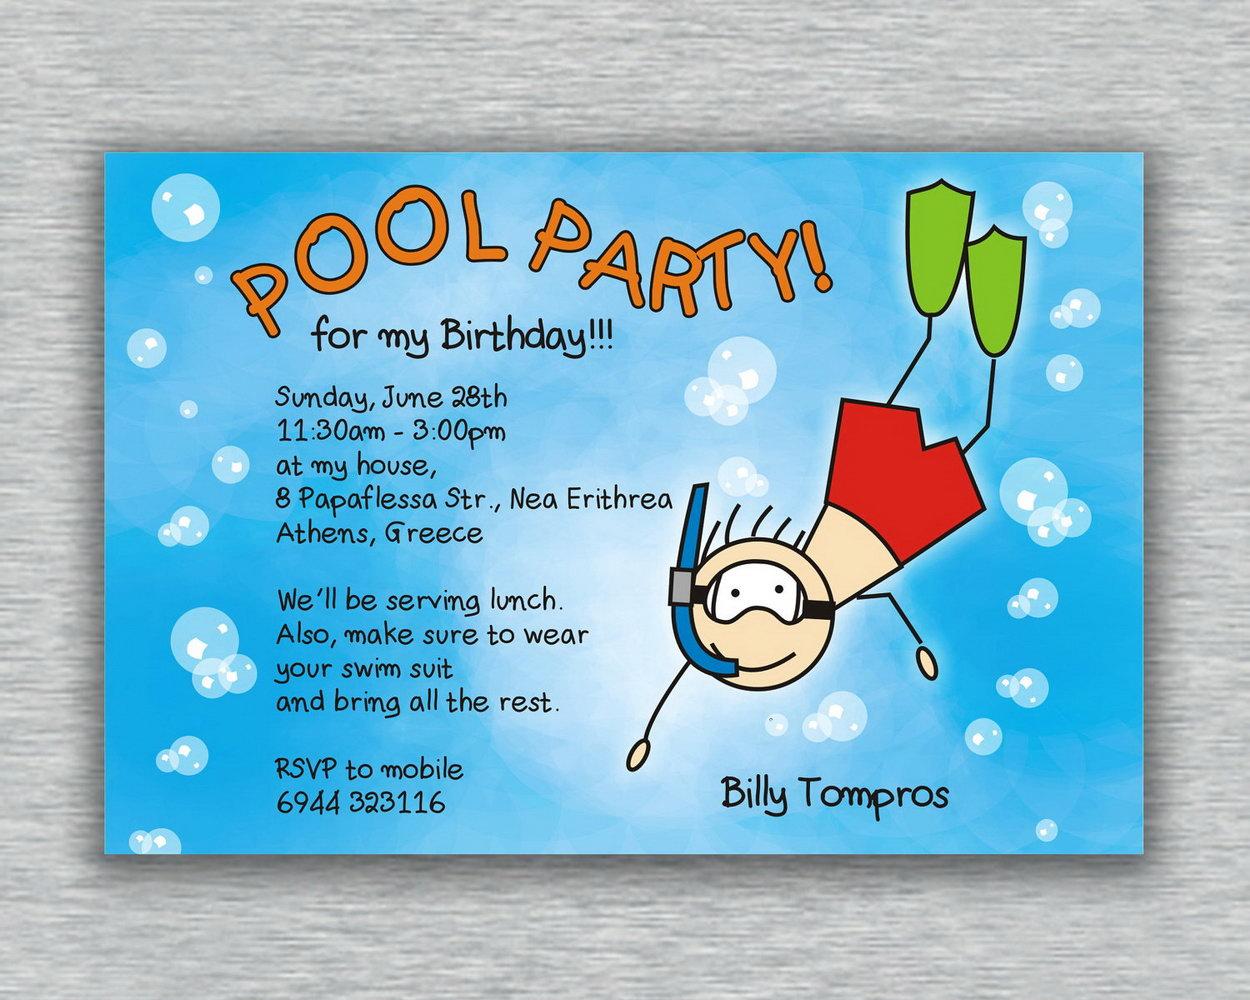 photo regarding Free Printable Pool Party Invitations Templates named Totally free Printable Pool Get together Invites Templates - Templates